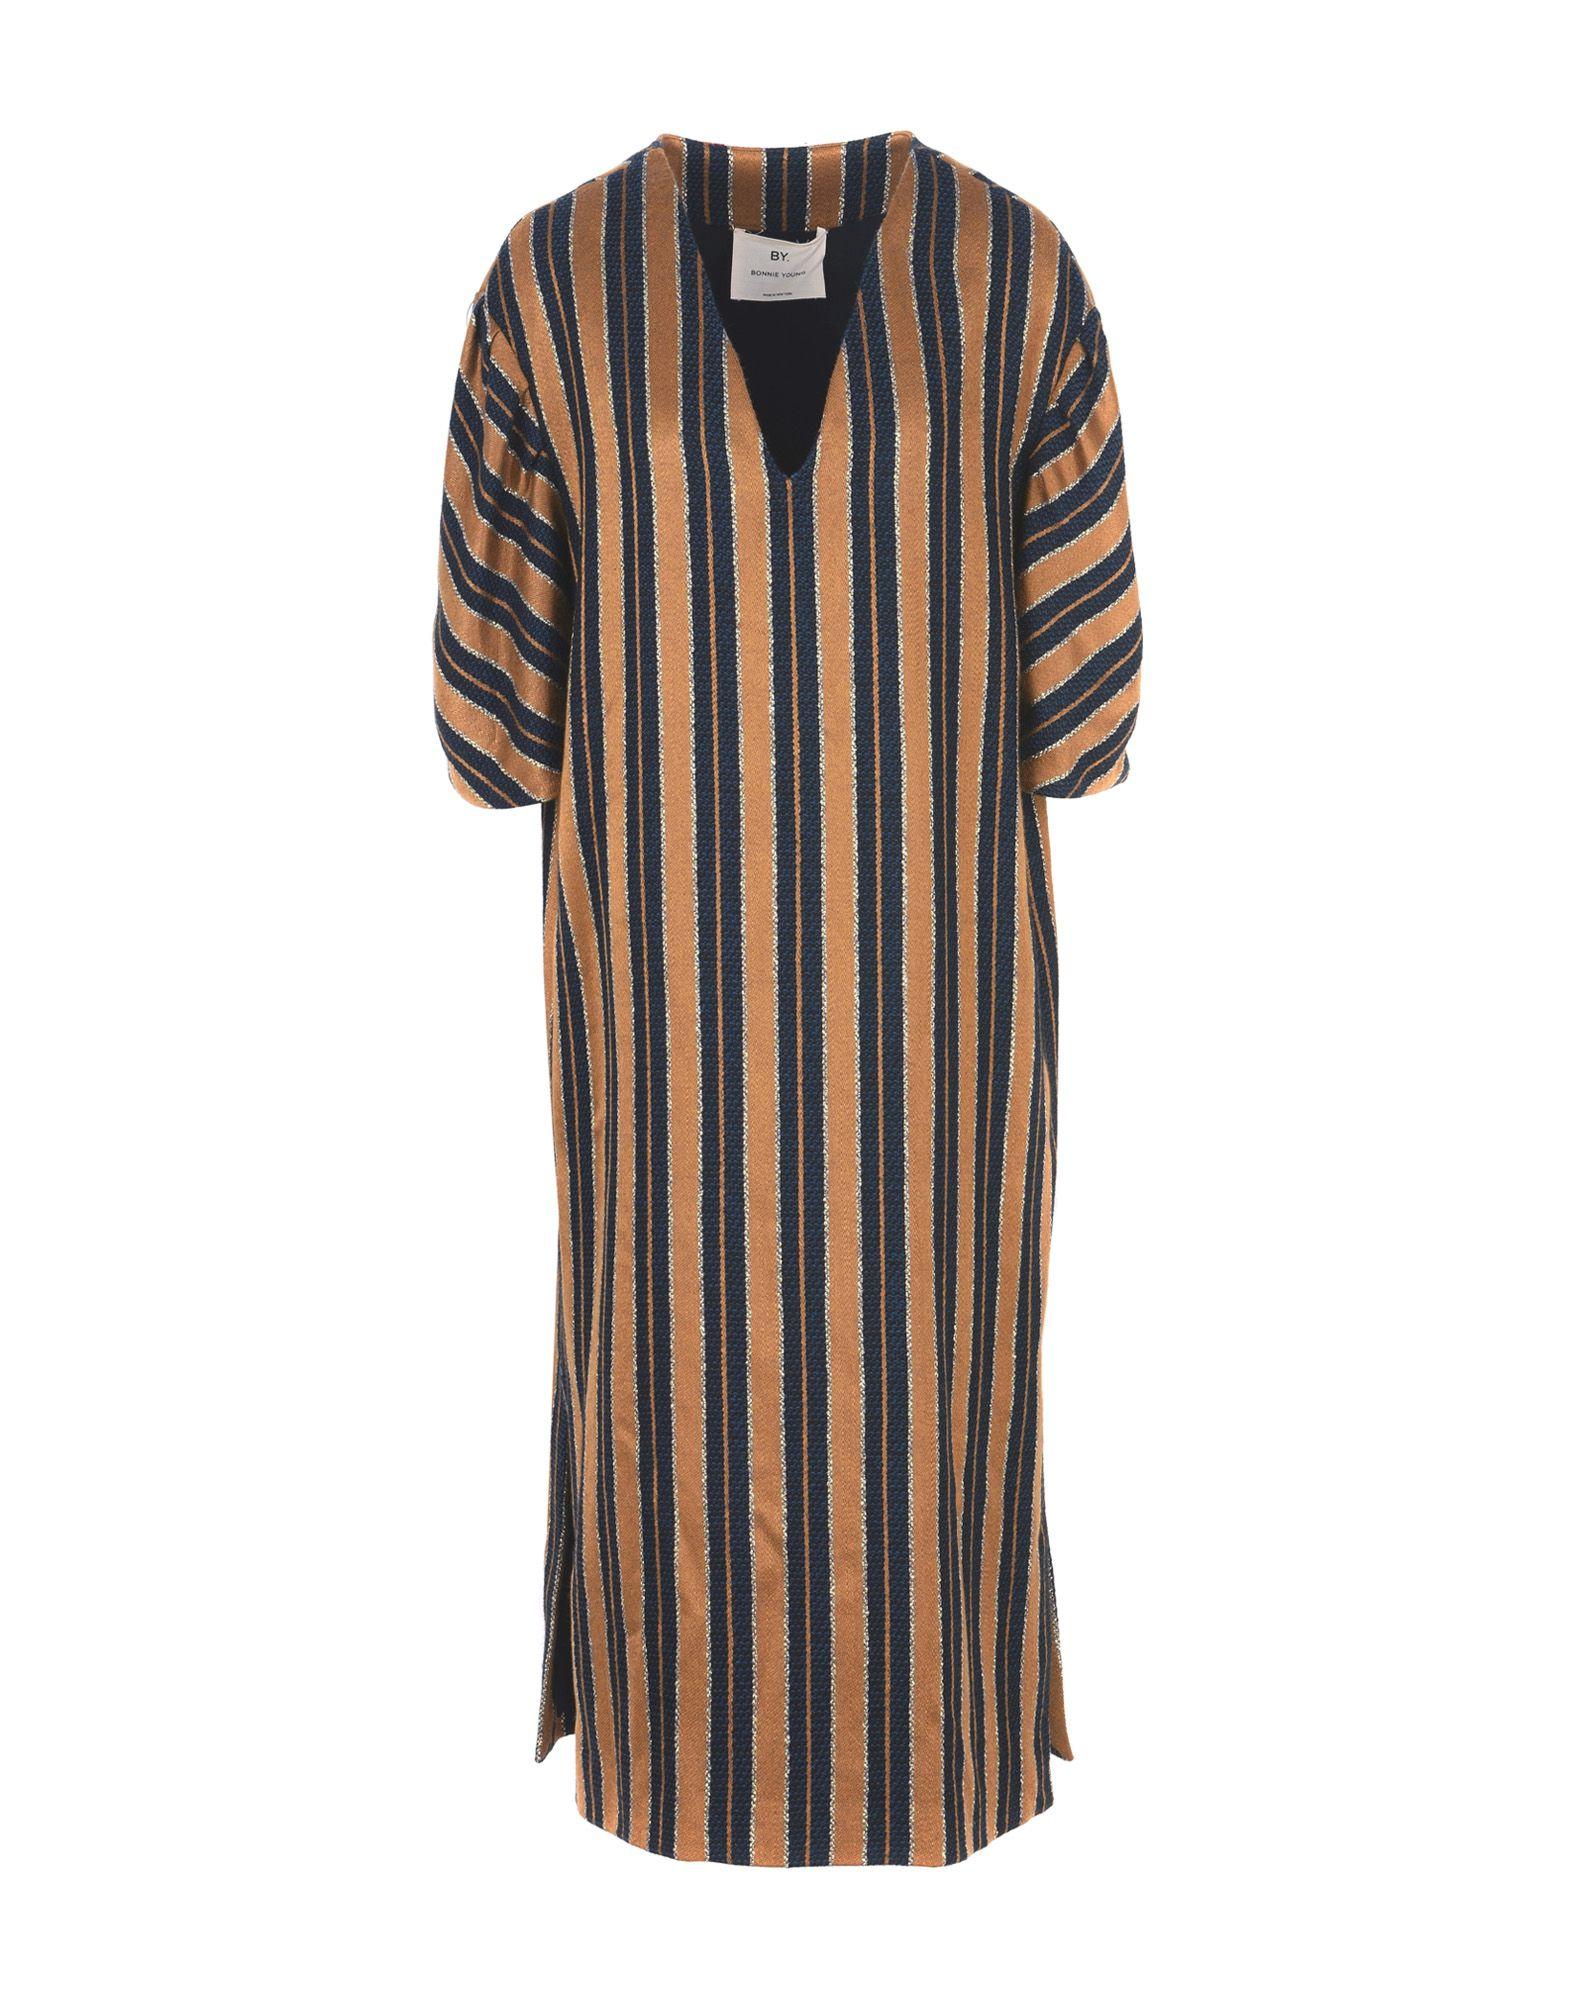 BY. BONNIE YOUNG Midi Dress in Ocher